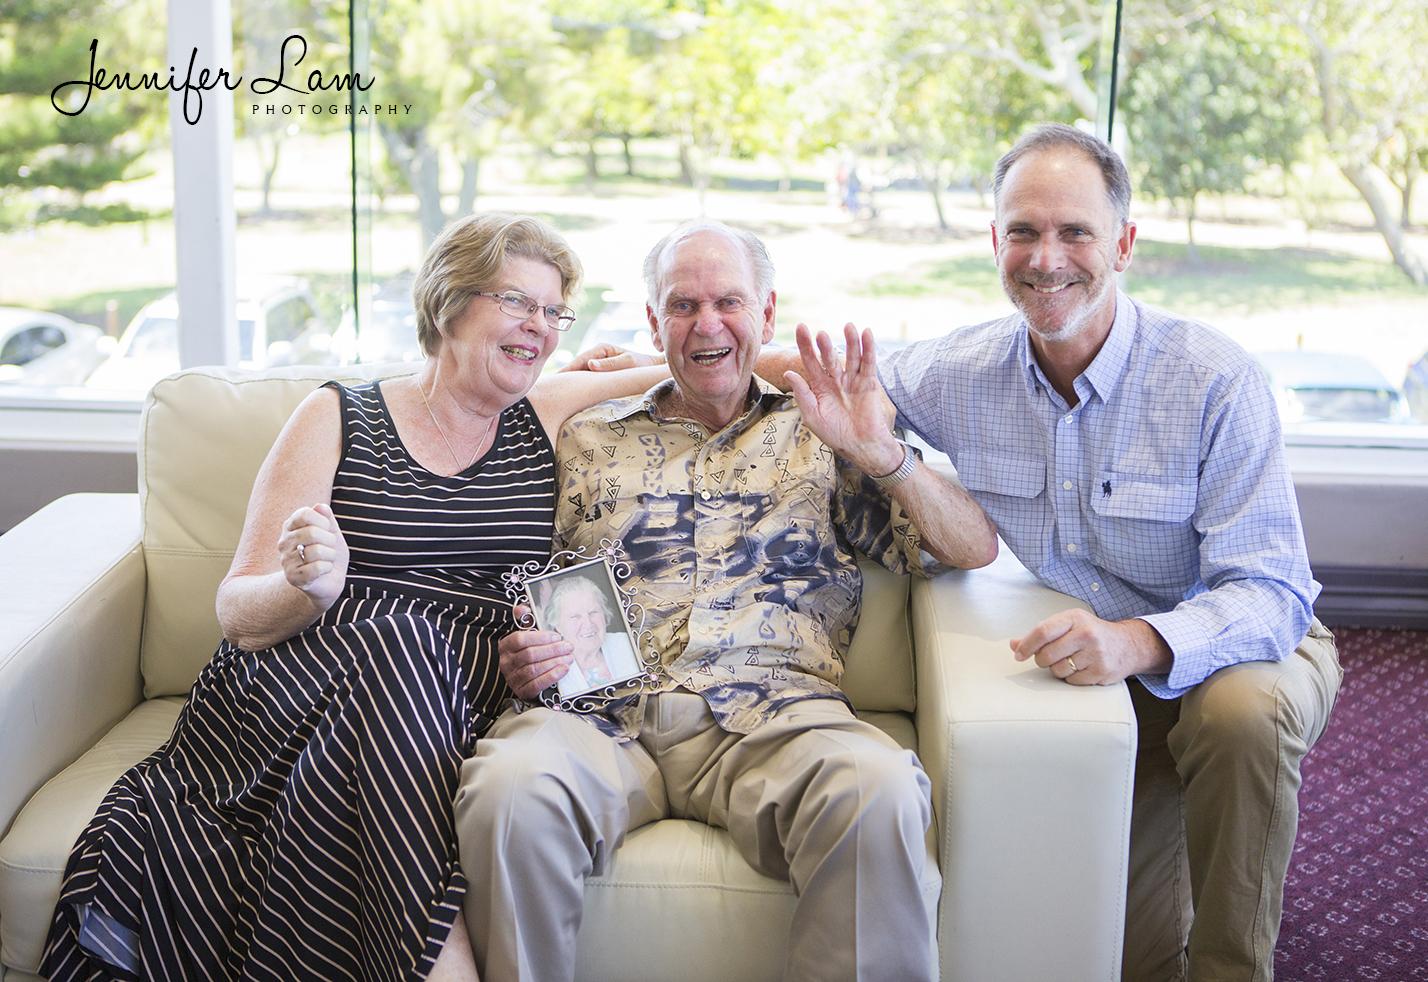 Jim's 90th Birthday - Event Photography - Jennifer Lam Photography (82).jpg